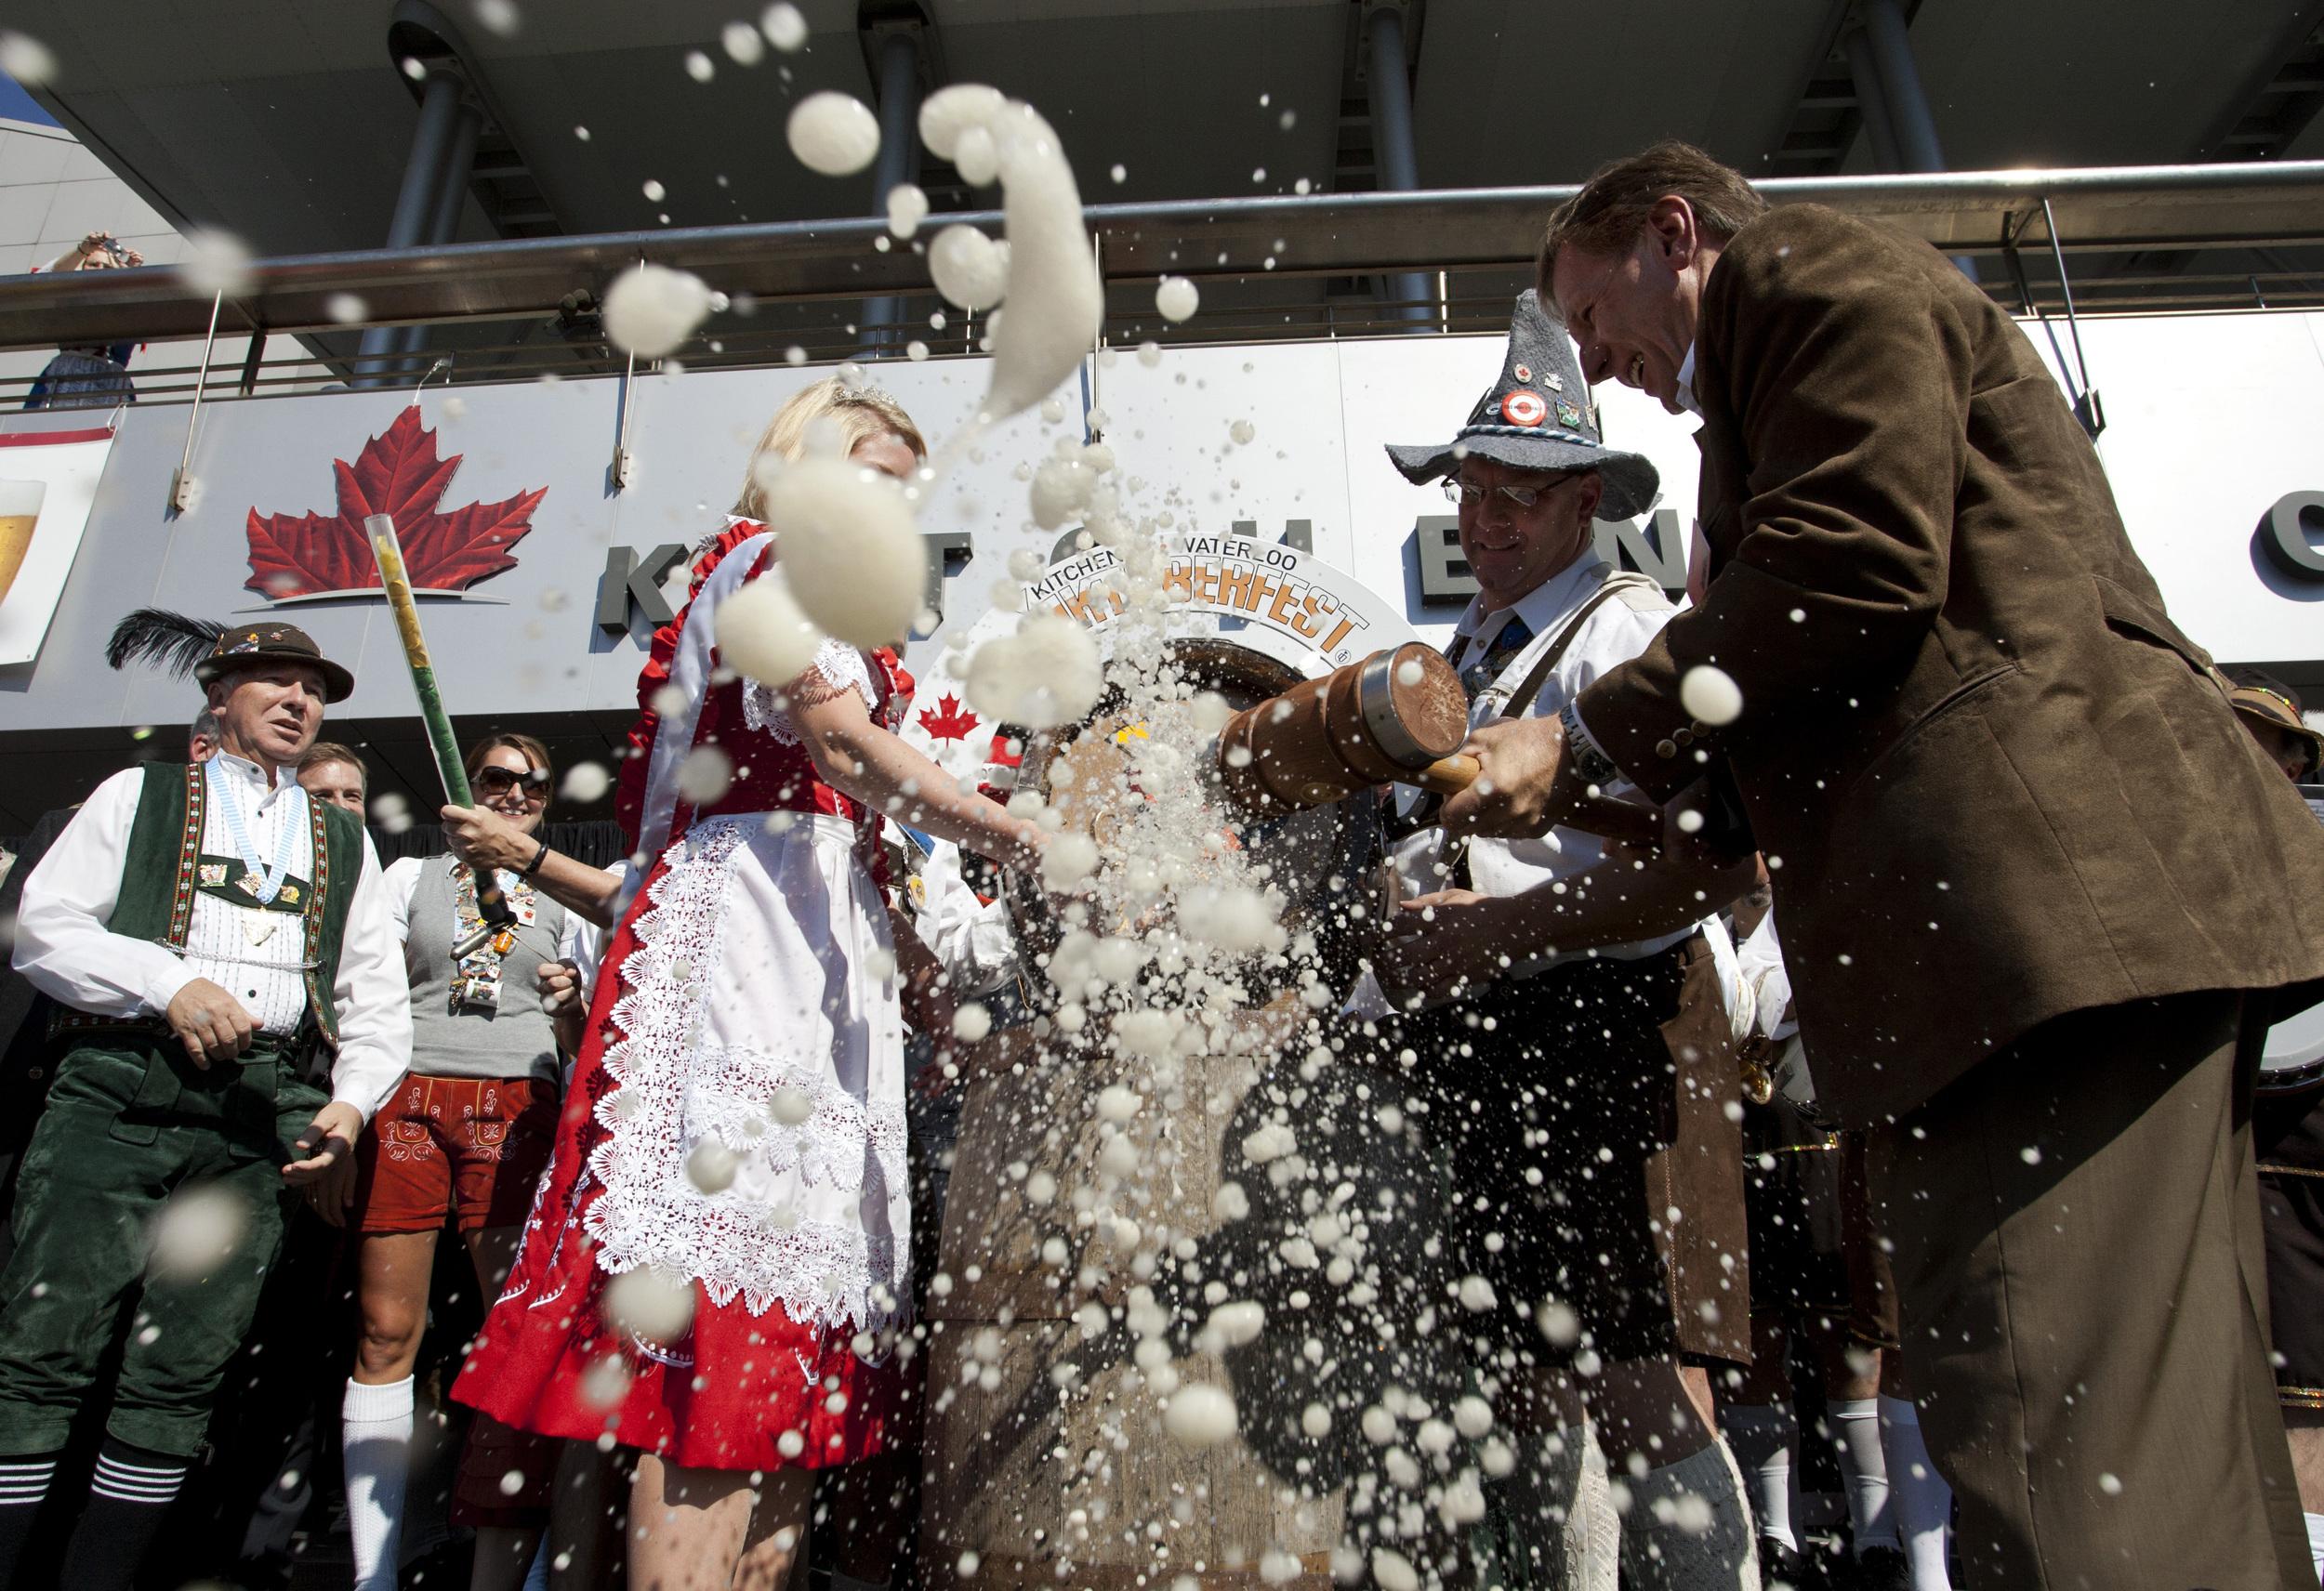 Kitchener mayor Carl Zehr kicks off Oktoberfest October 7, 2011.